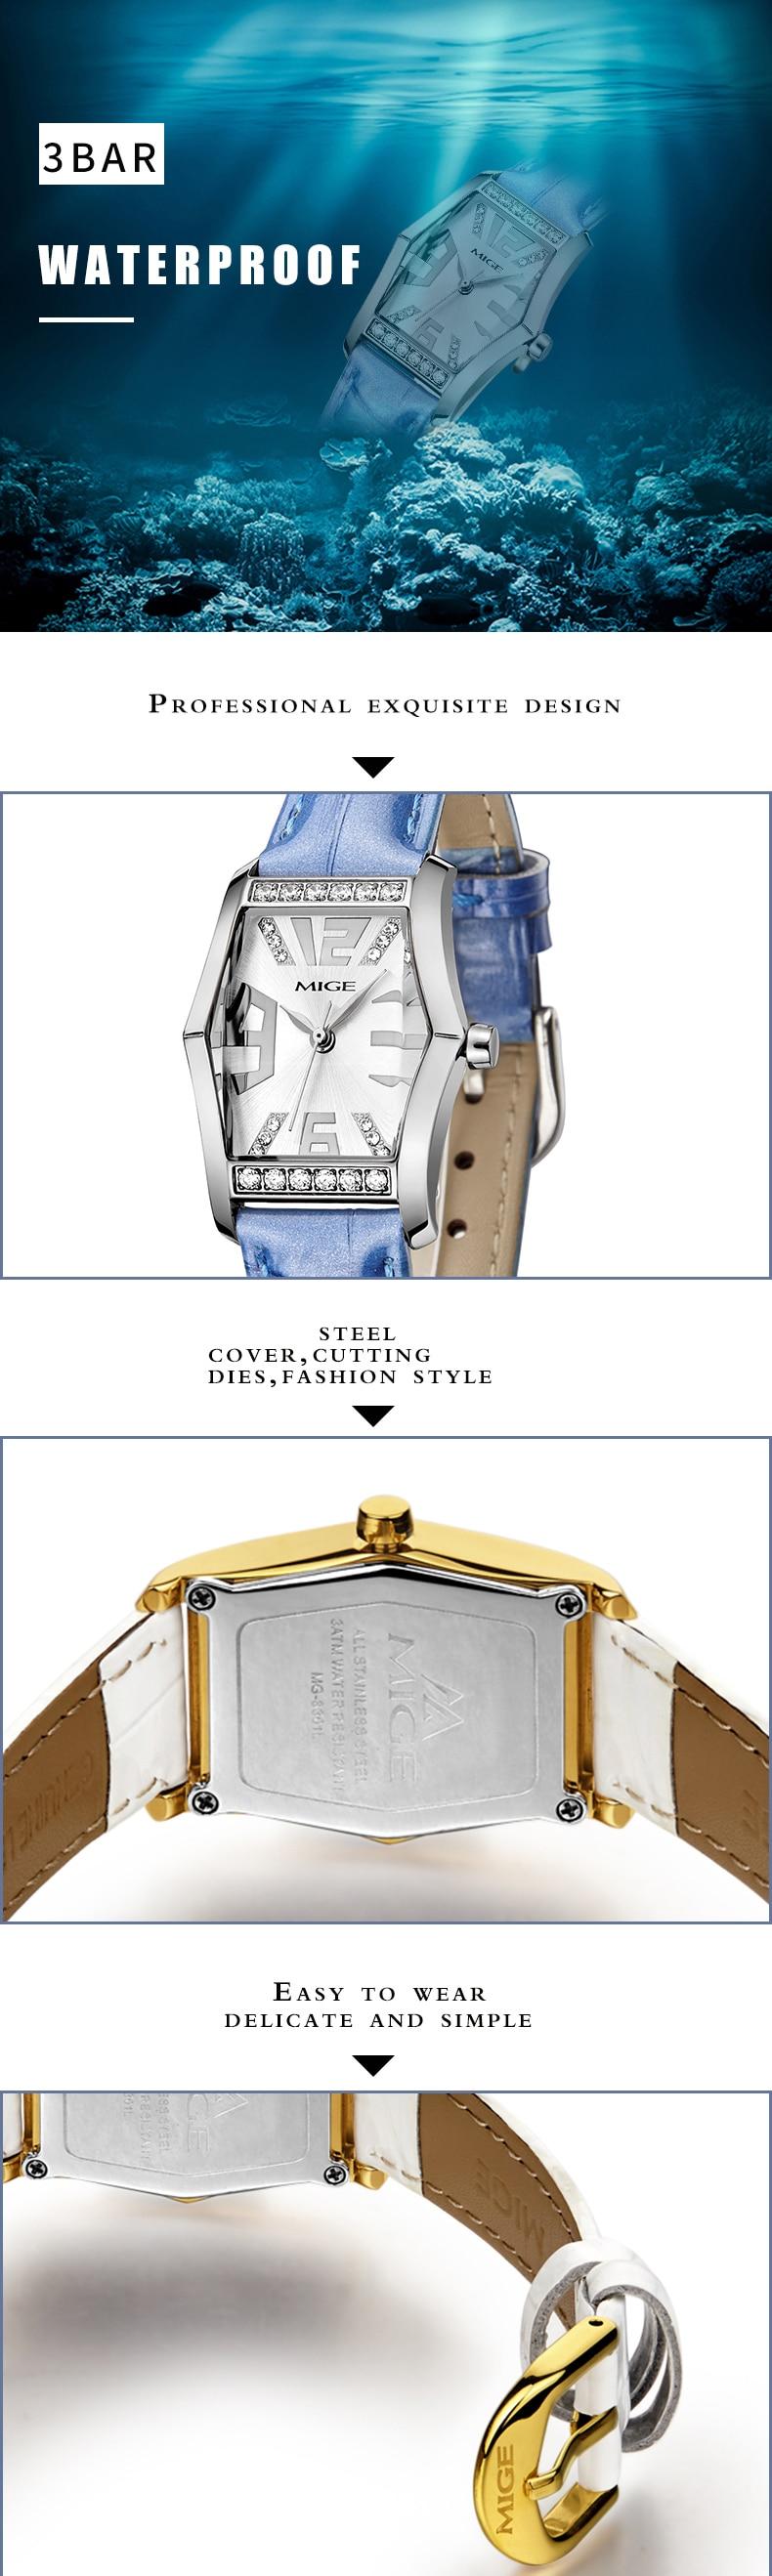 senhoras relógio à prova dwaterproof água relógios quartzo feminino